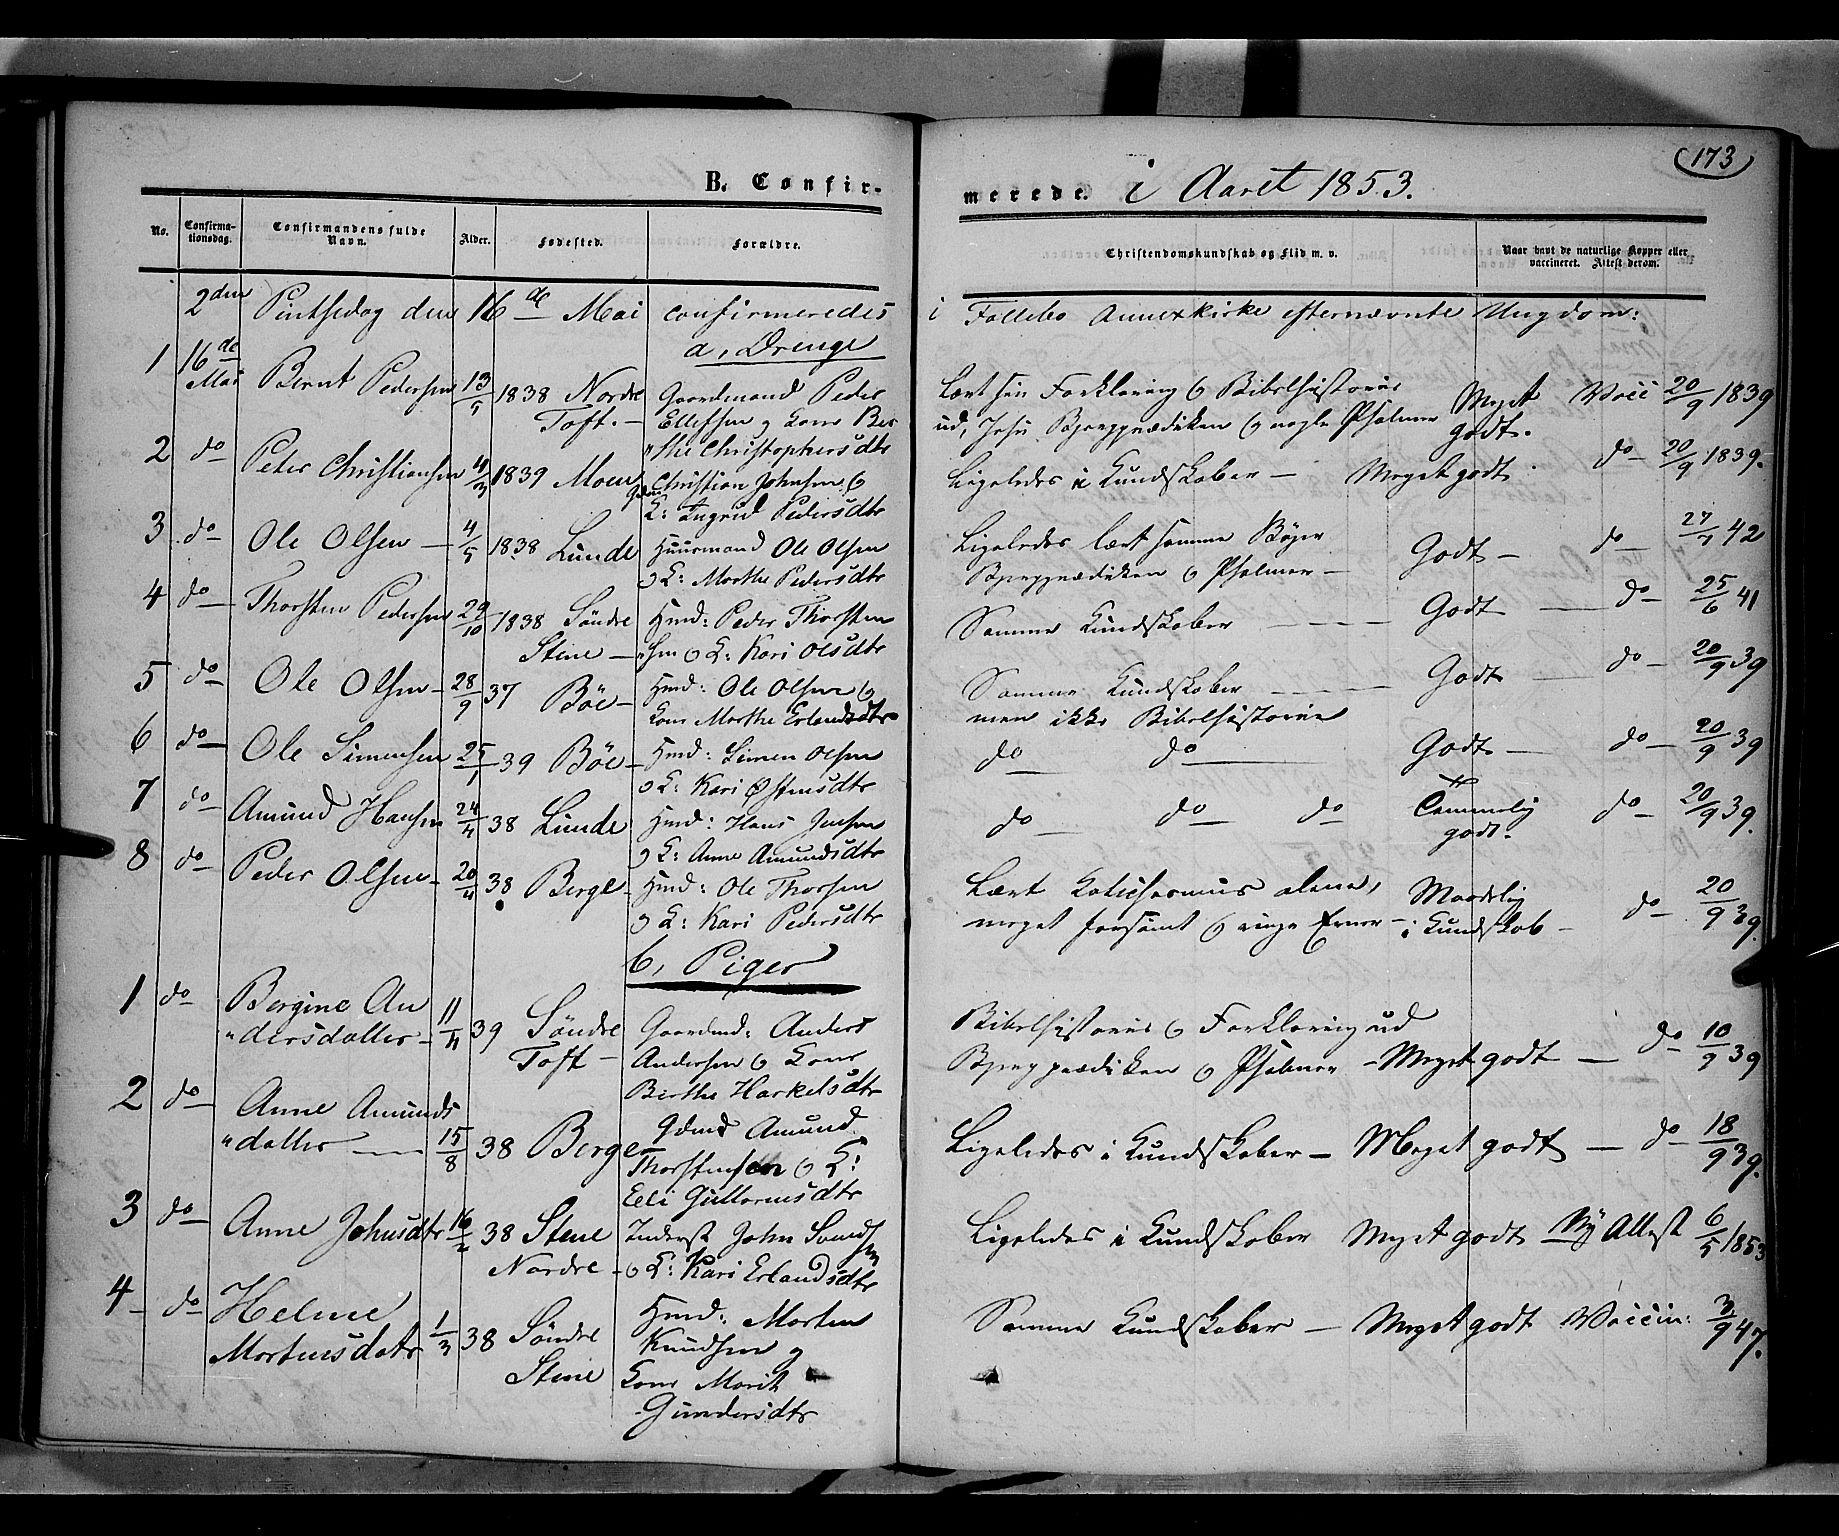 SAH, Gausdal prestekontor, Ministerialbok nr. 8, 1850-1861, s. 173